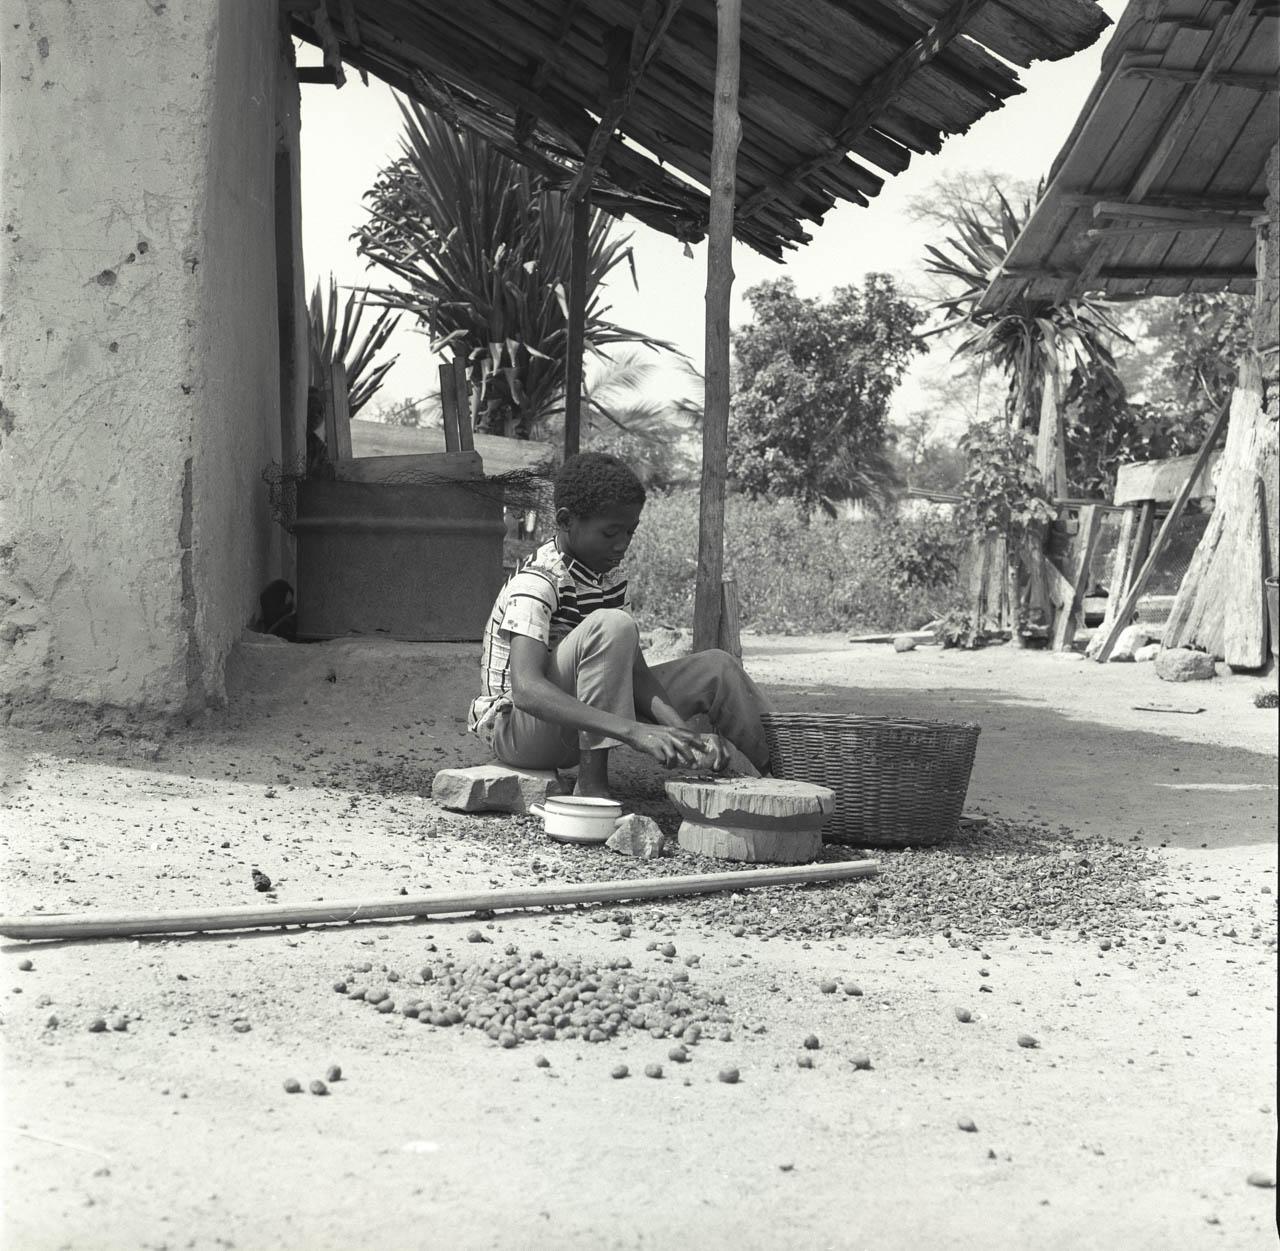 boy w mortar pestle.jpg